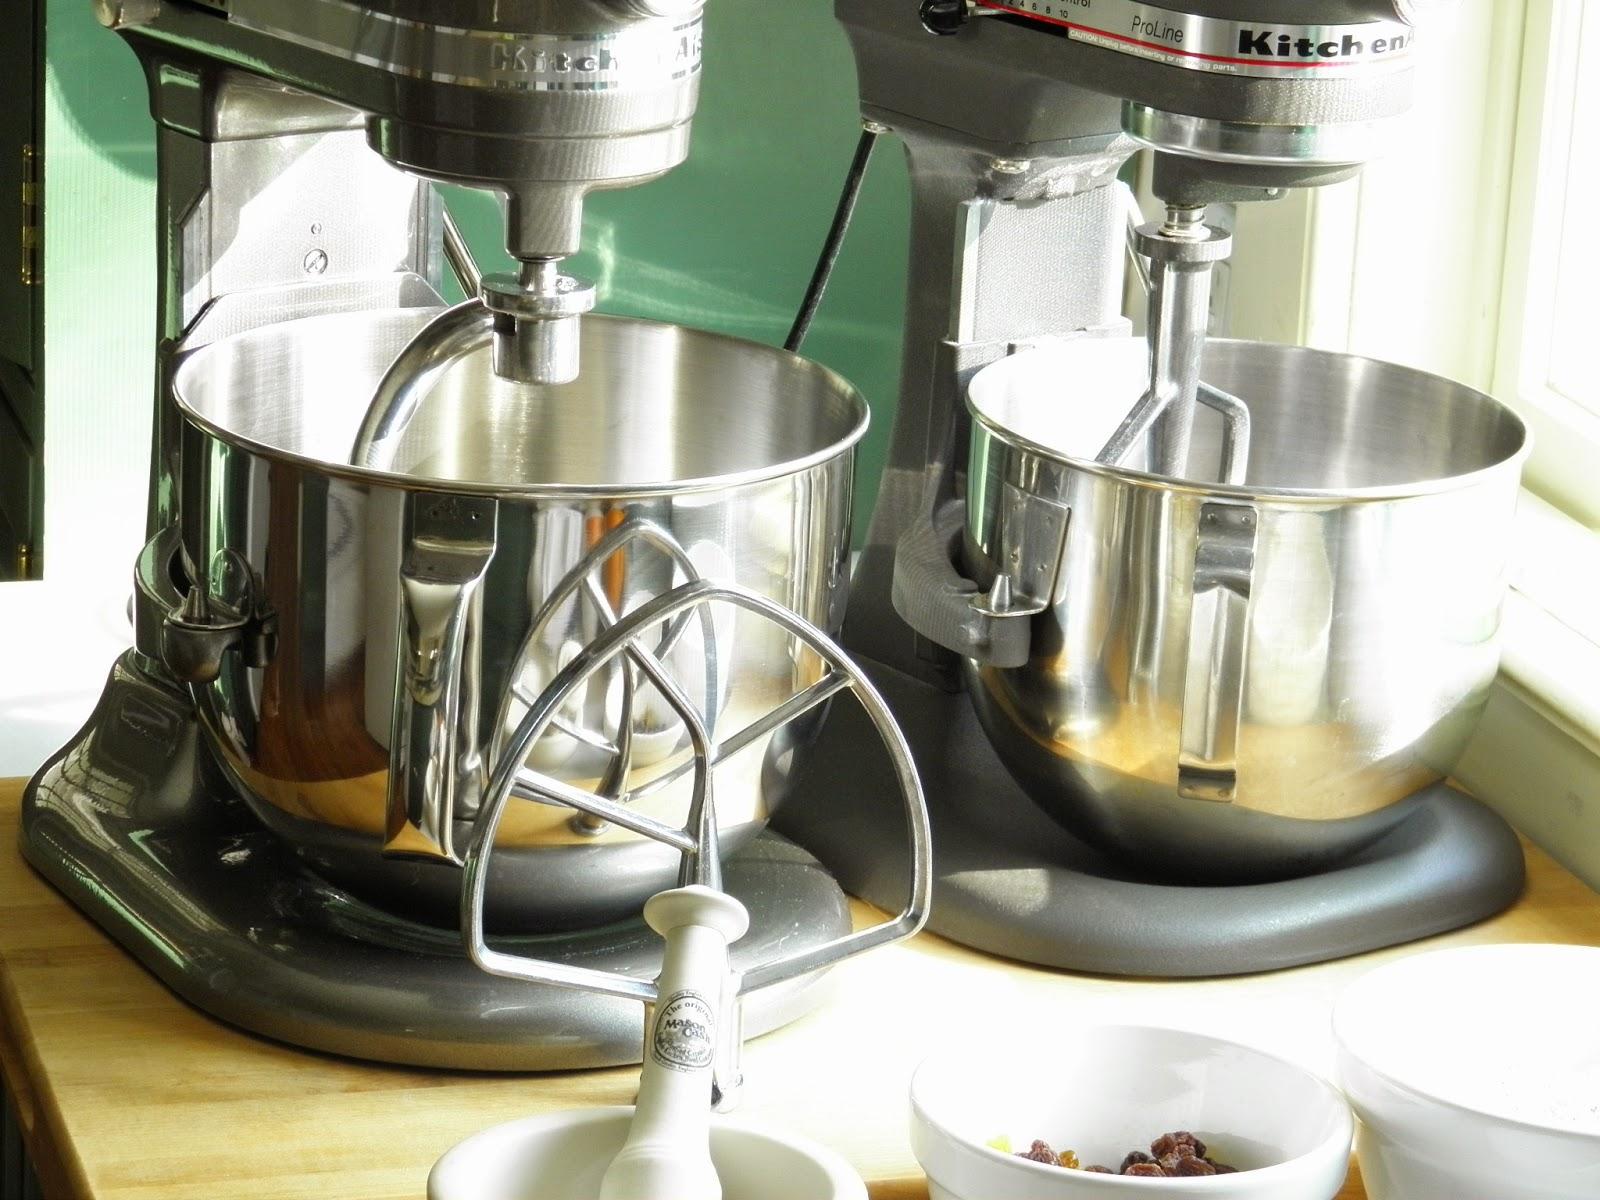 Kitchenaid 174 Pro Line 174 Series 7 Qt Mixer